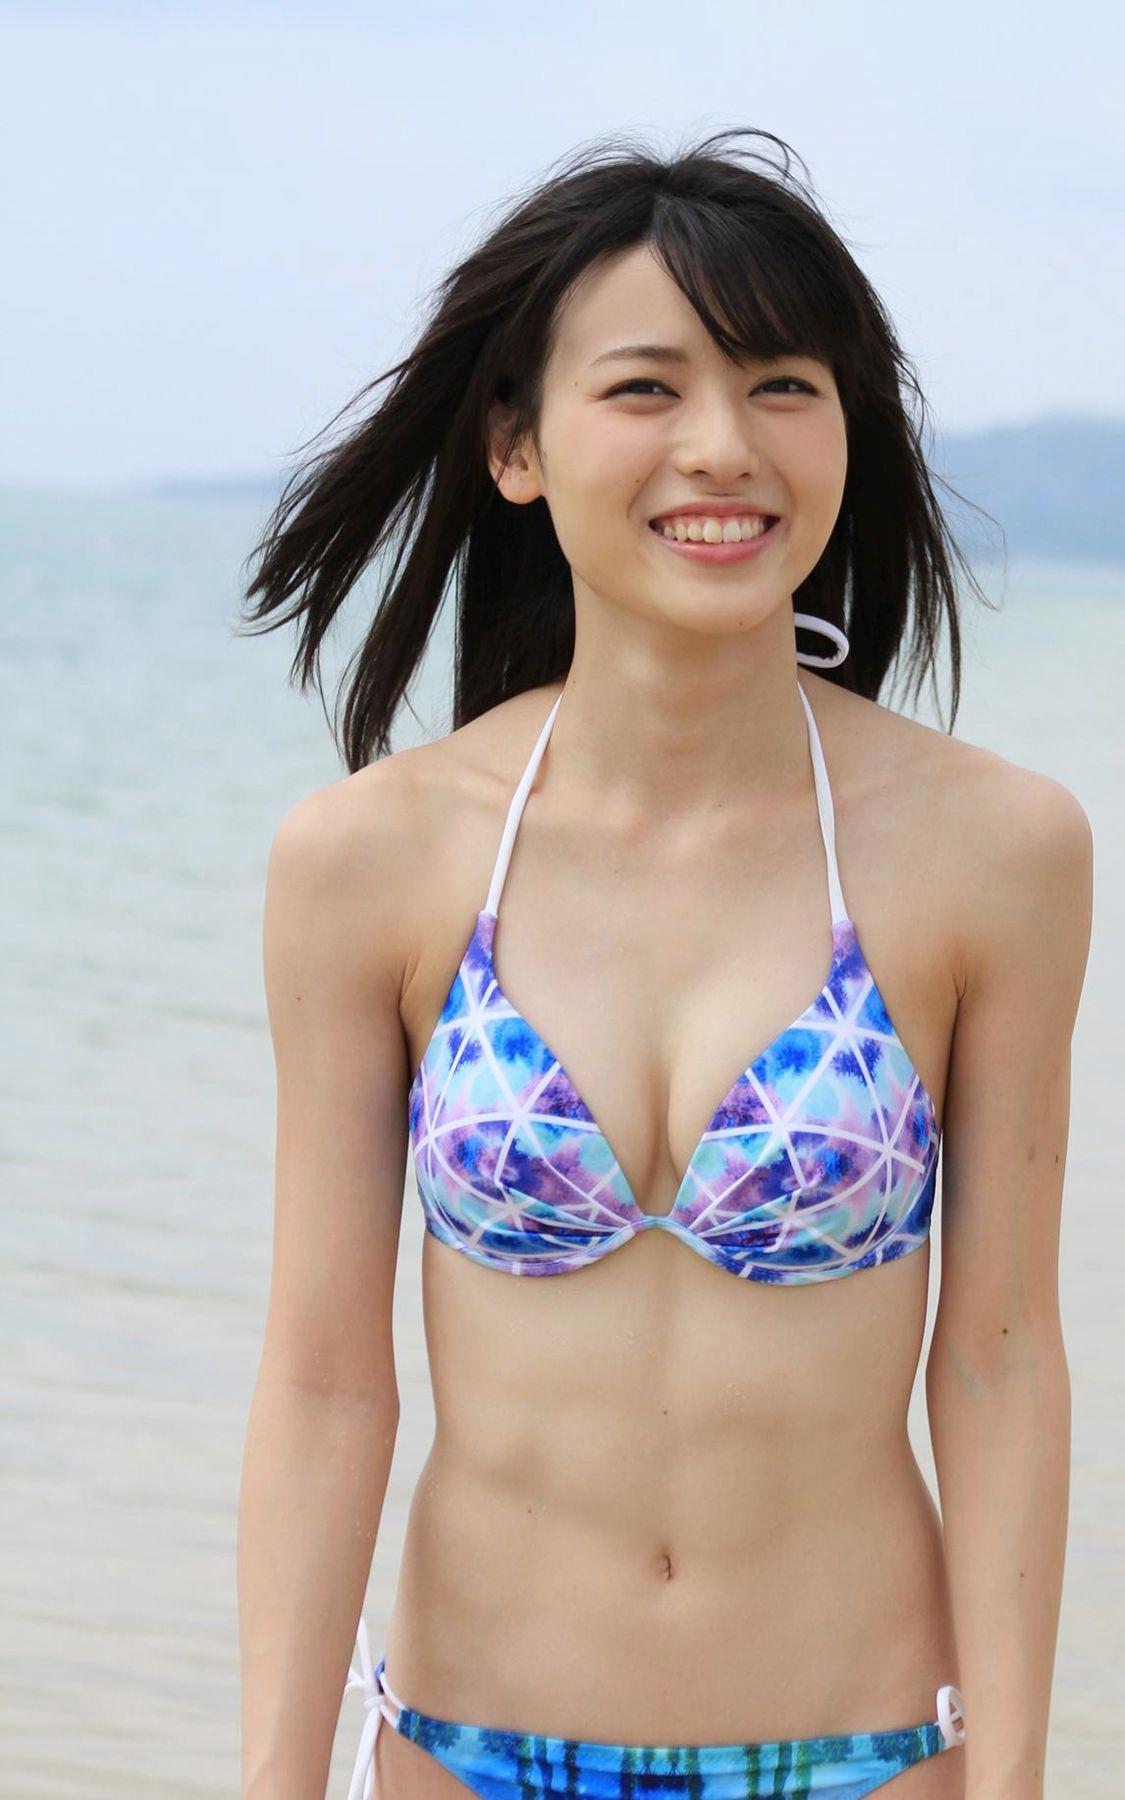 矢島舞美 エロ画像 18